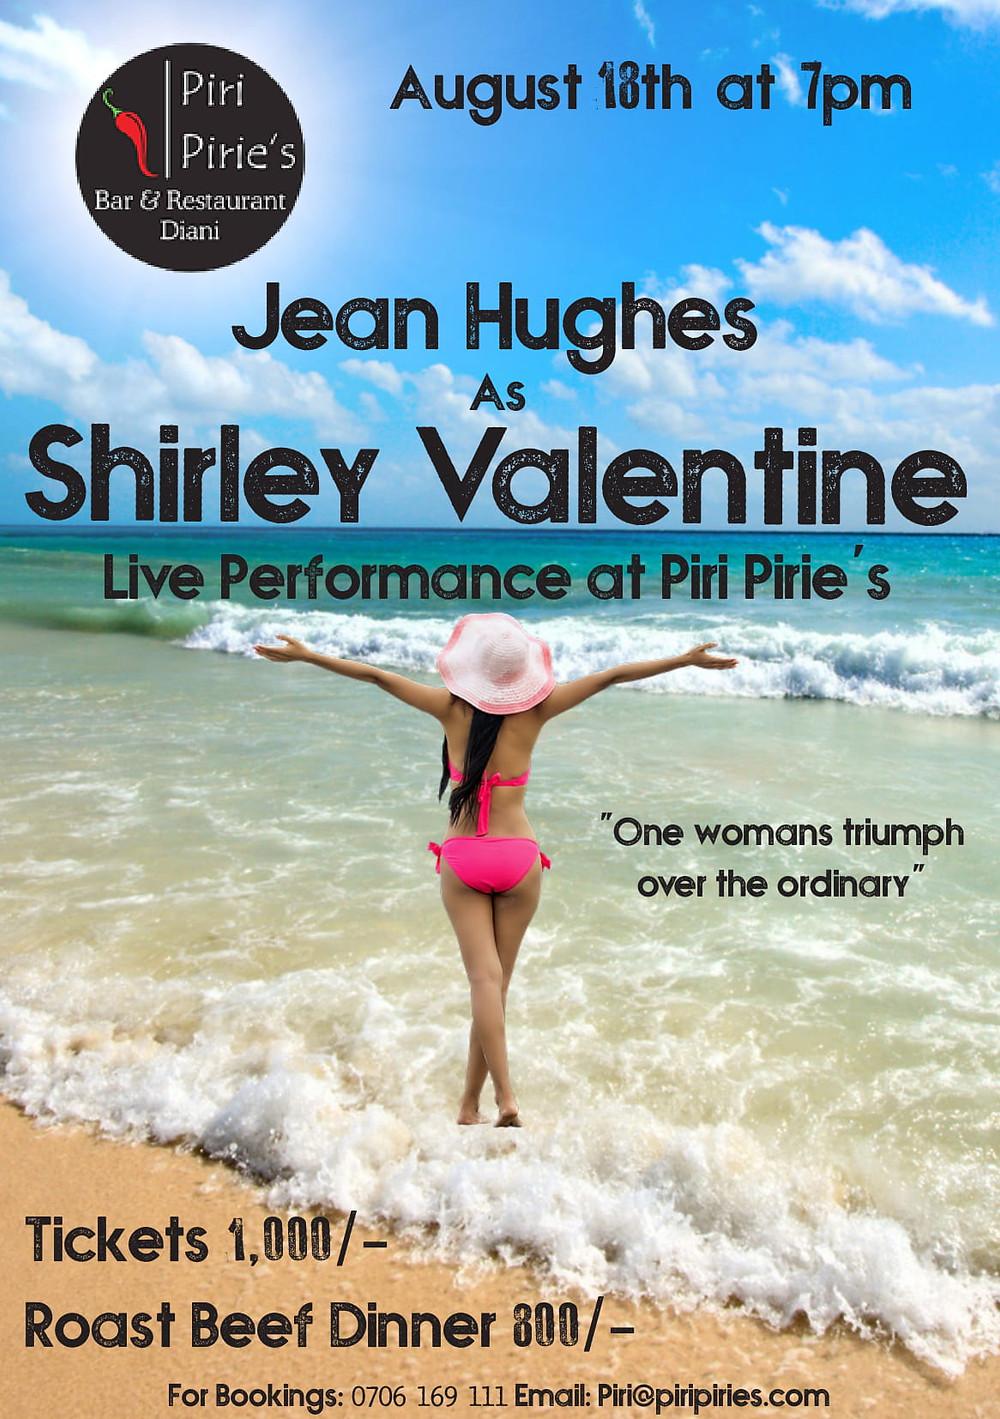 Shirley Valetine - Staring Jean Hughes at Piri Piries on 18th Aug.